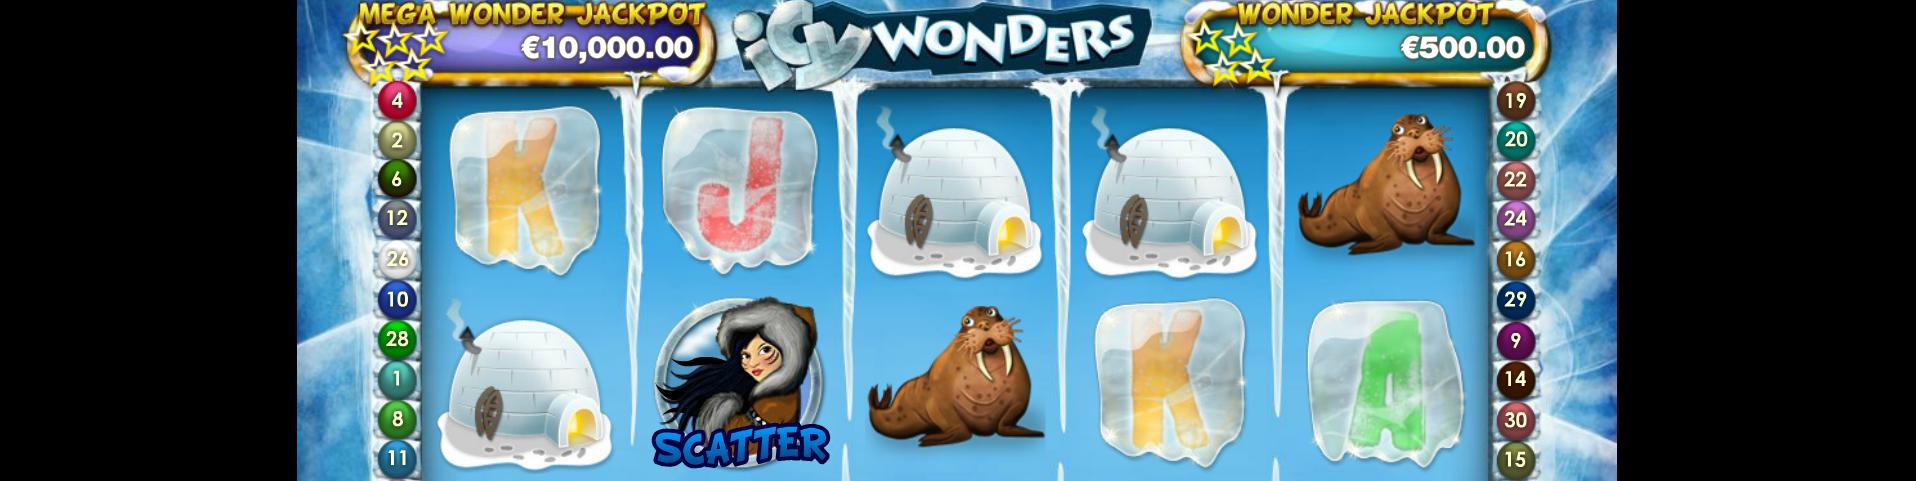 icy wonders netent kolikkopelit toripelit